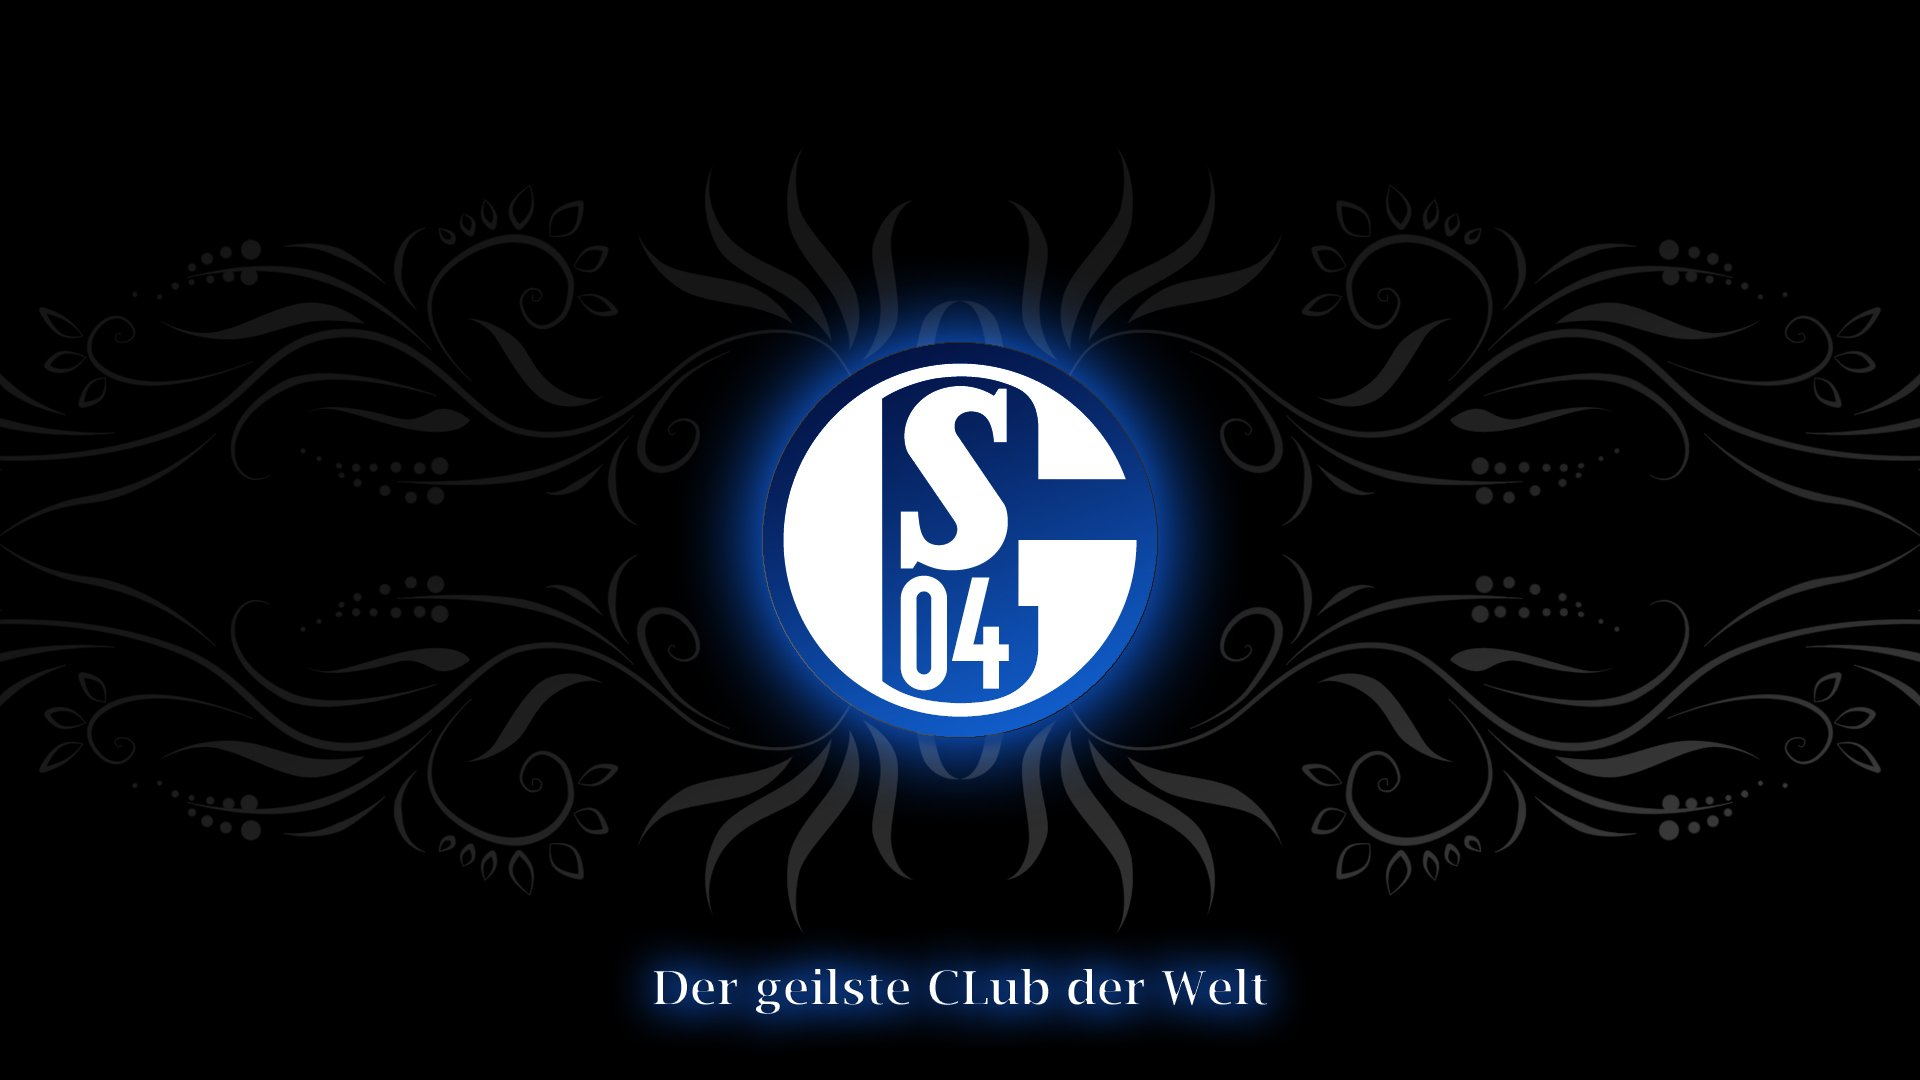 Schalke Logo Hd Wallpaper Hintergrund 1920x1080 Id 970275 Wallpaper Abyss